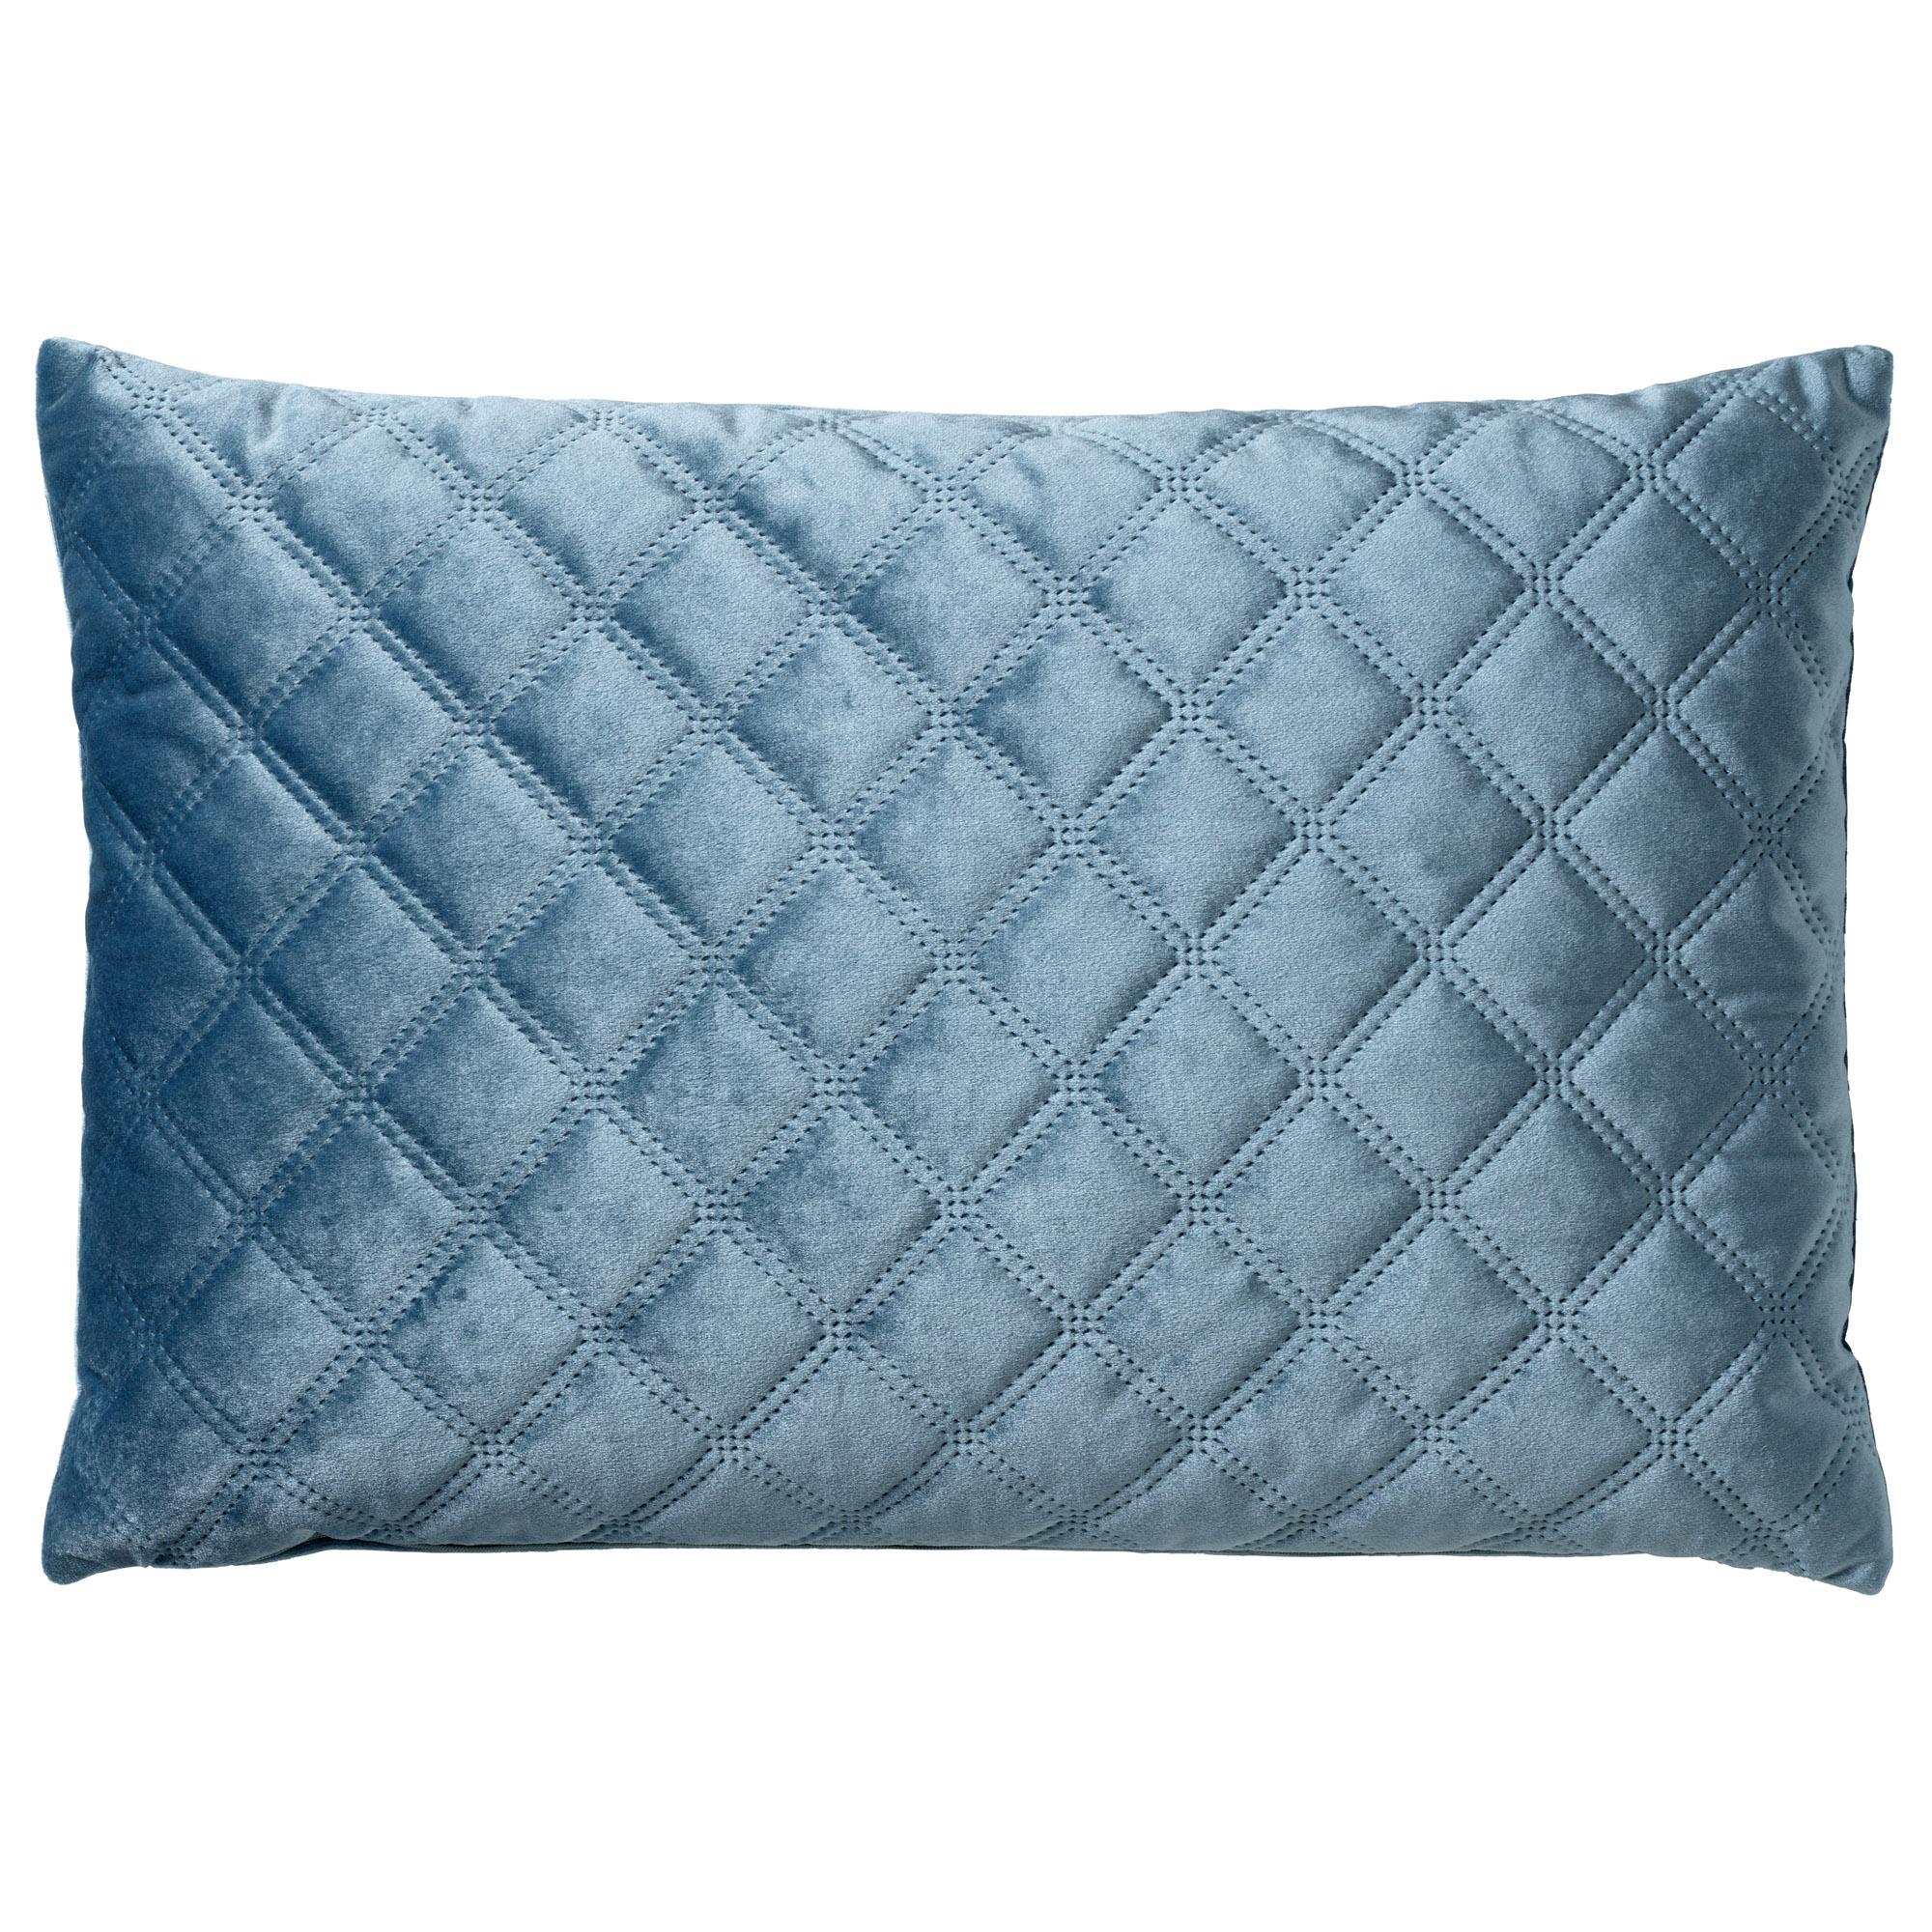 Coussin en velours Bleu 40x60